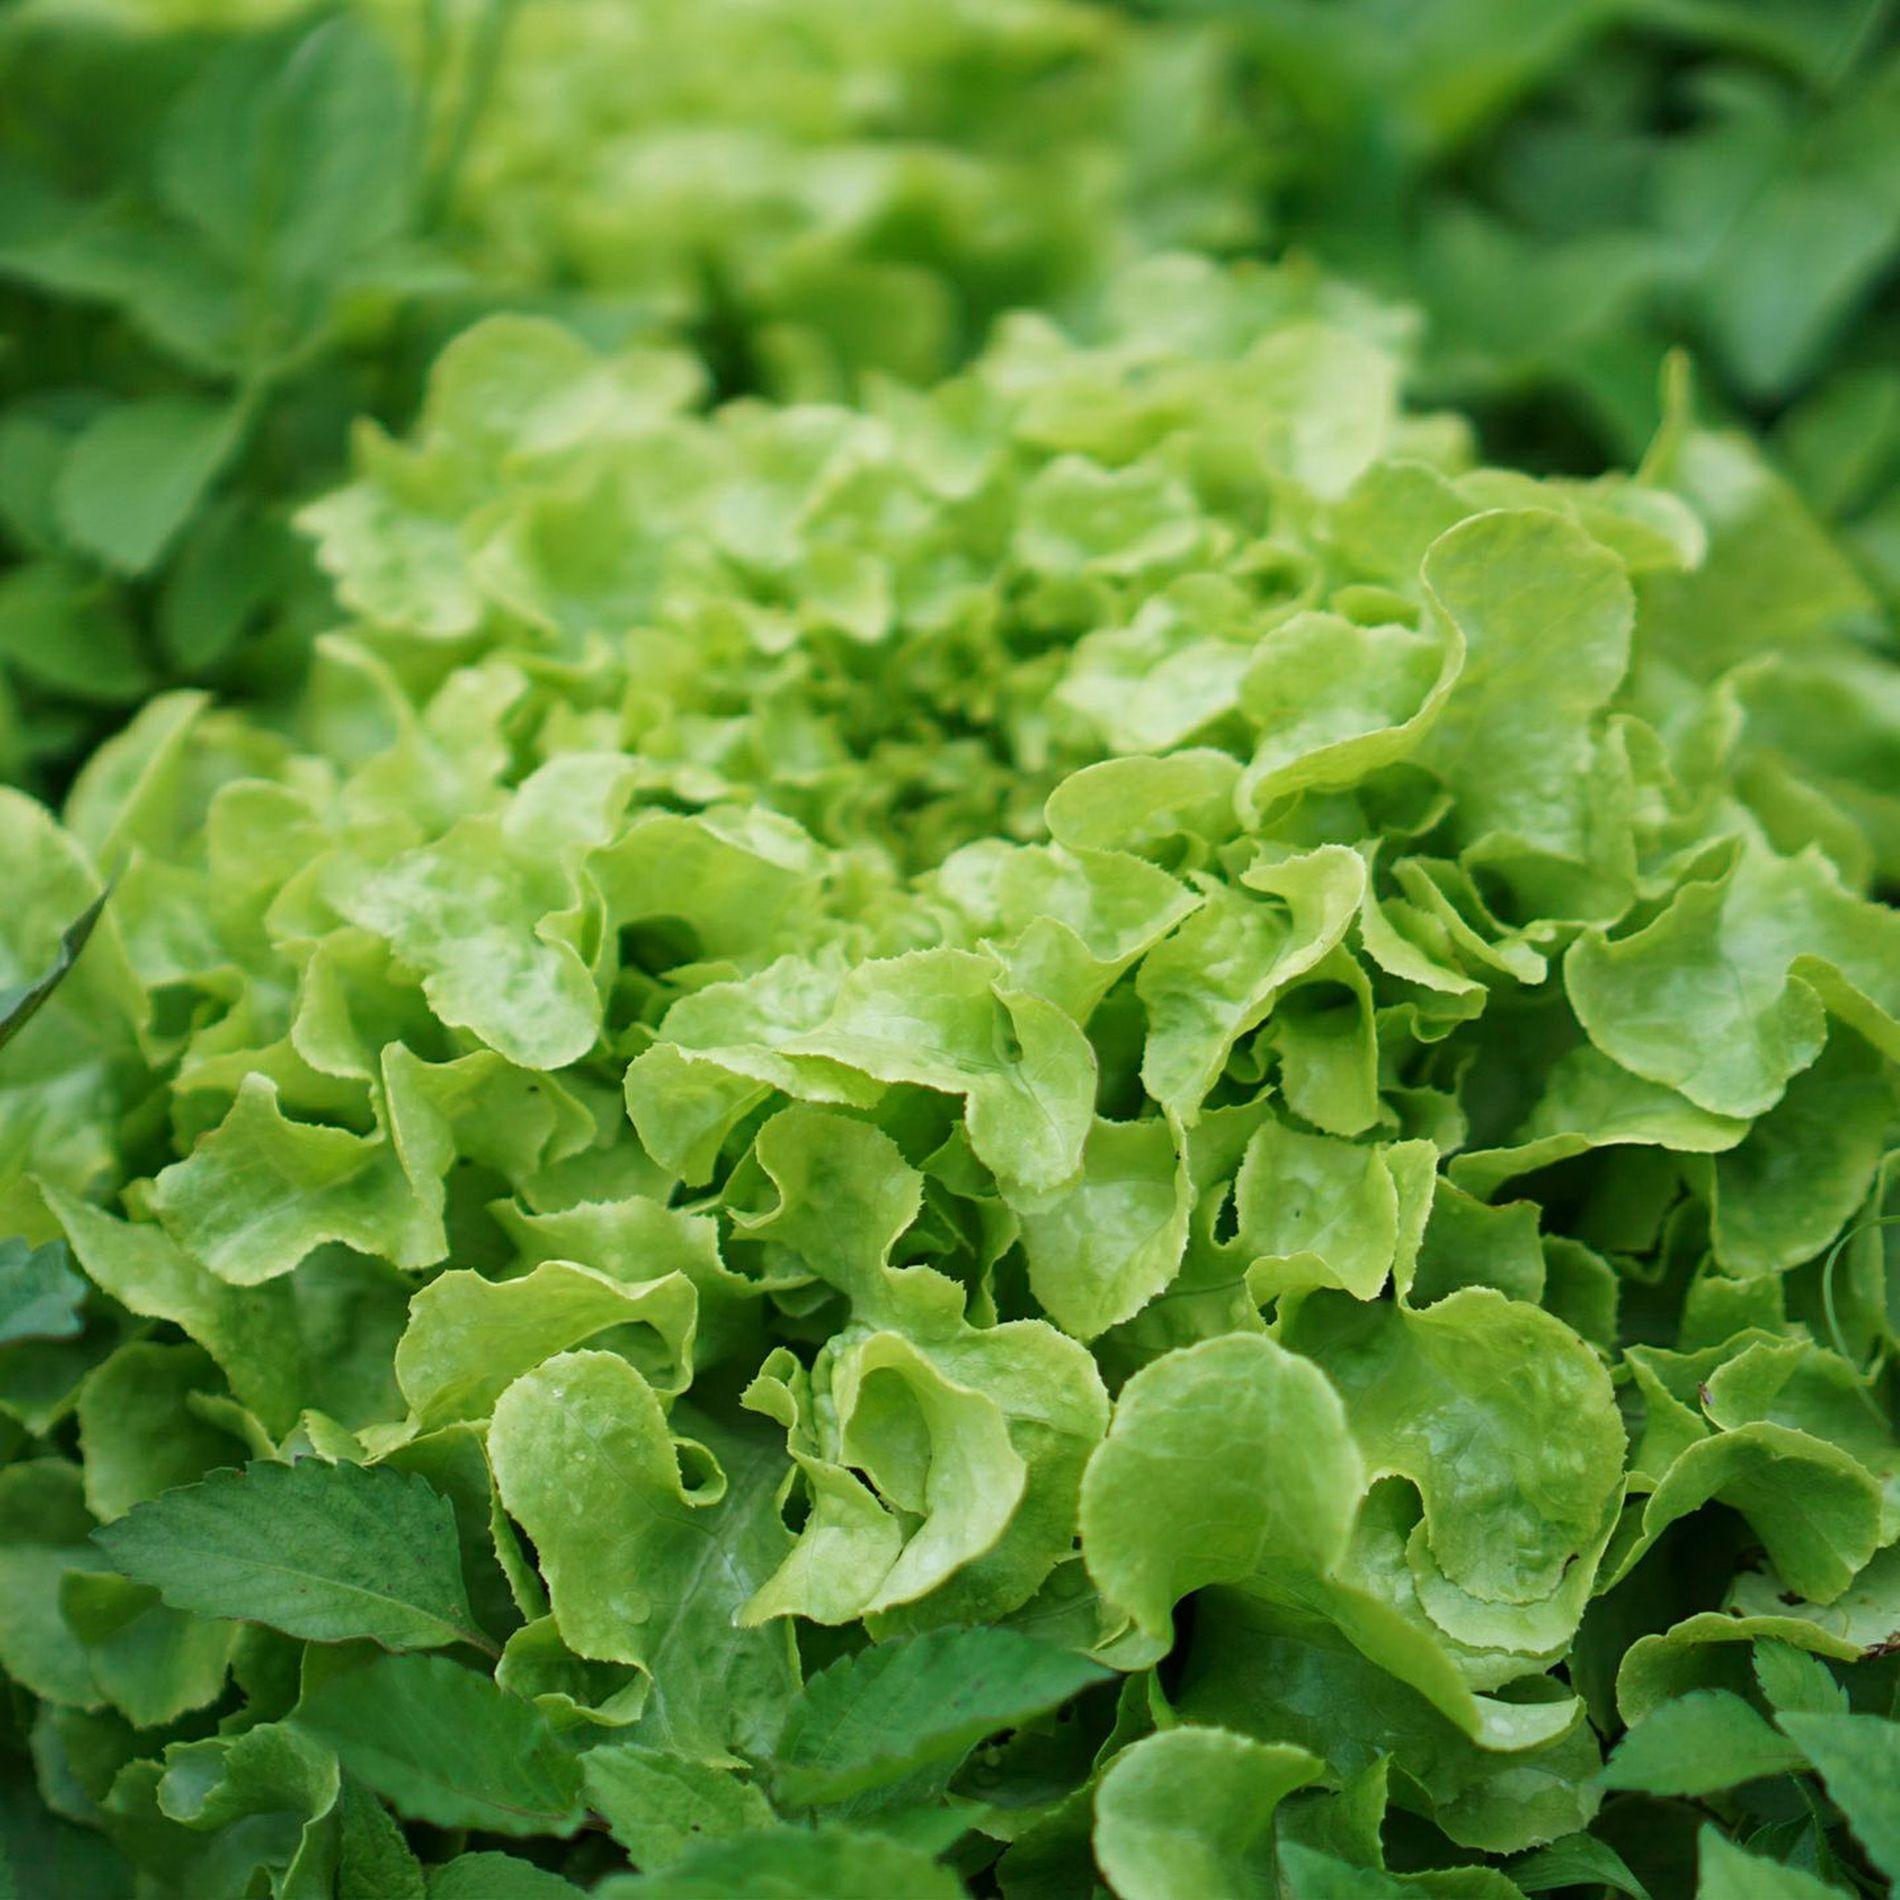 Busch 1213 HO Cabbage /& Lettuce vegetables sealed pack suit OO